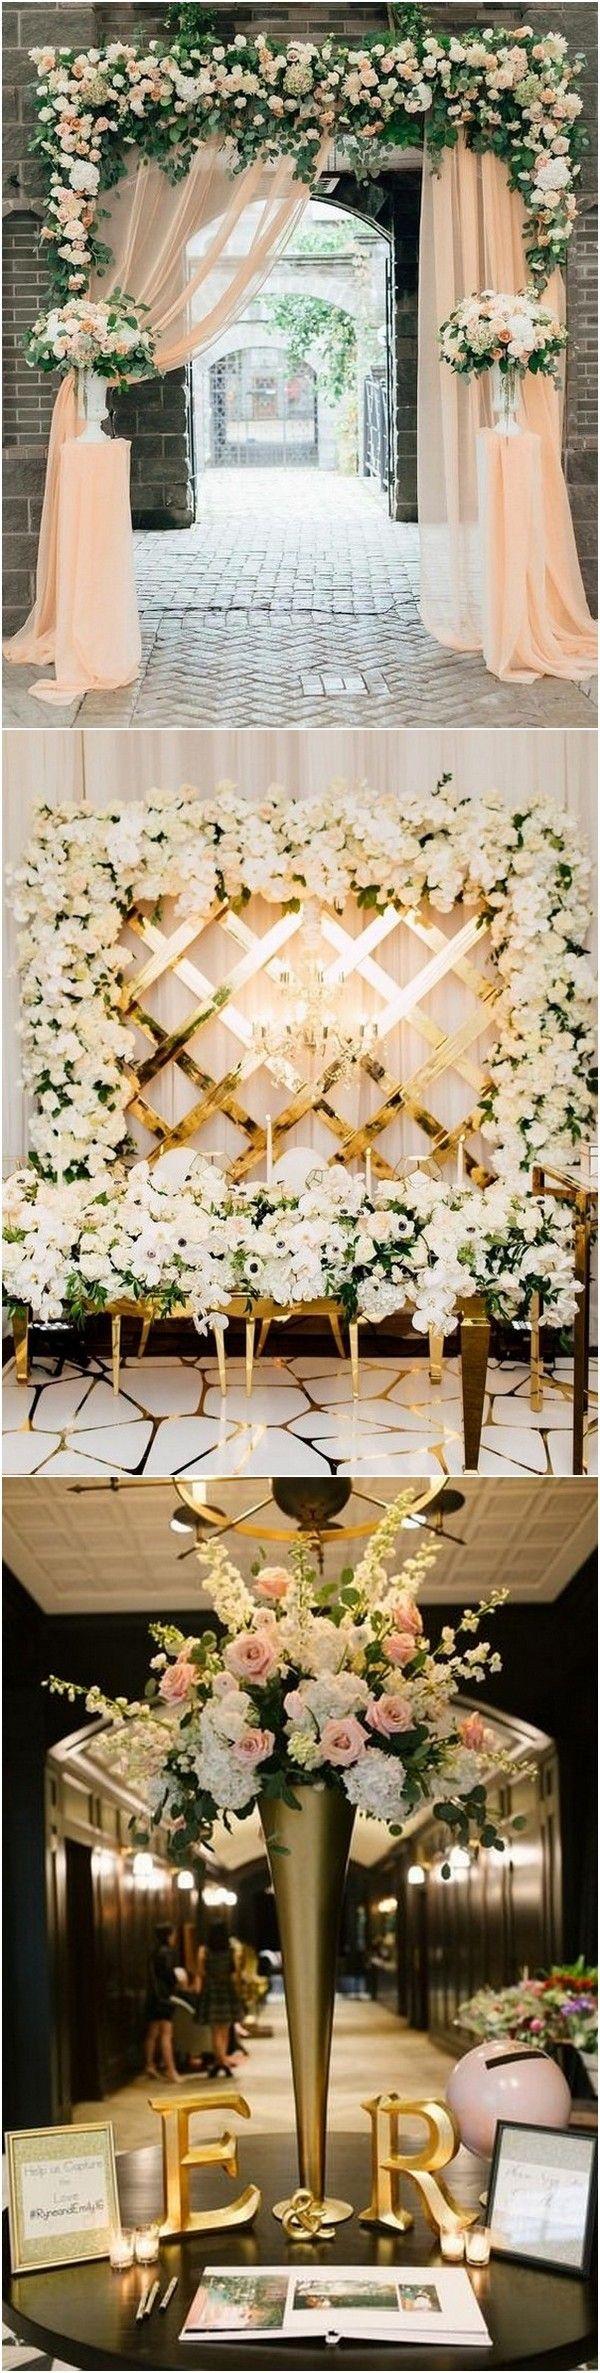 Wedding venue decoration ideas  Top  Wedding Entrance Decoration Ideas for Your Reception